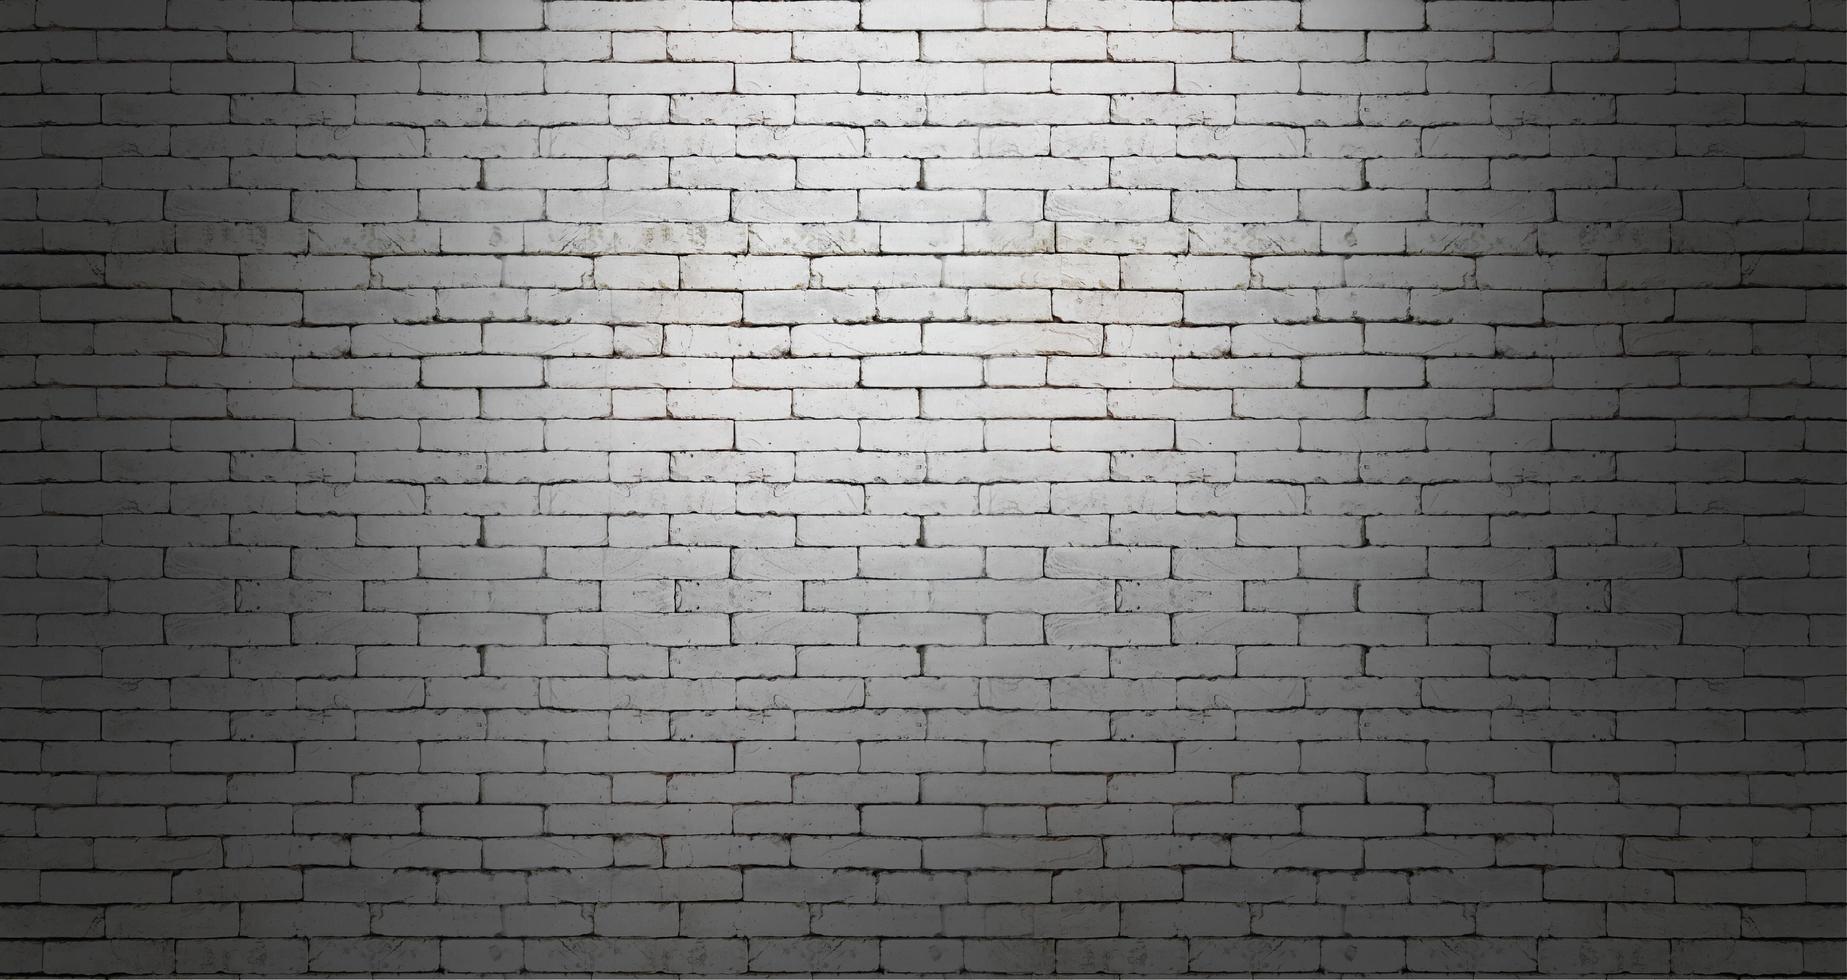 White brick wall on dark room background photo